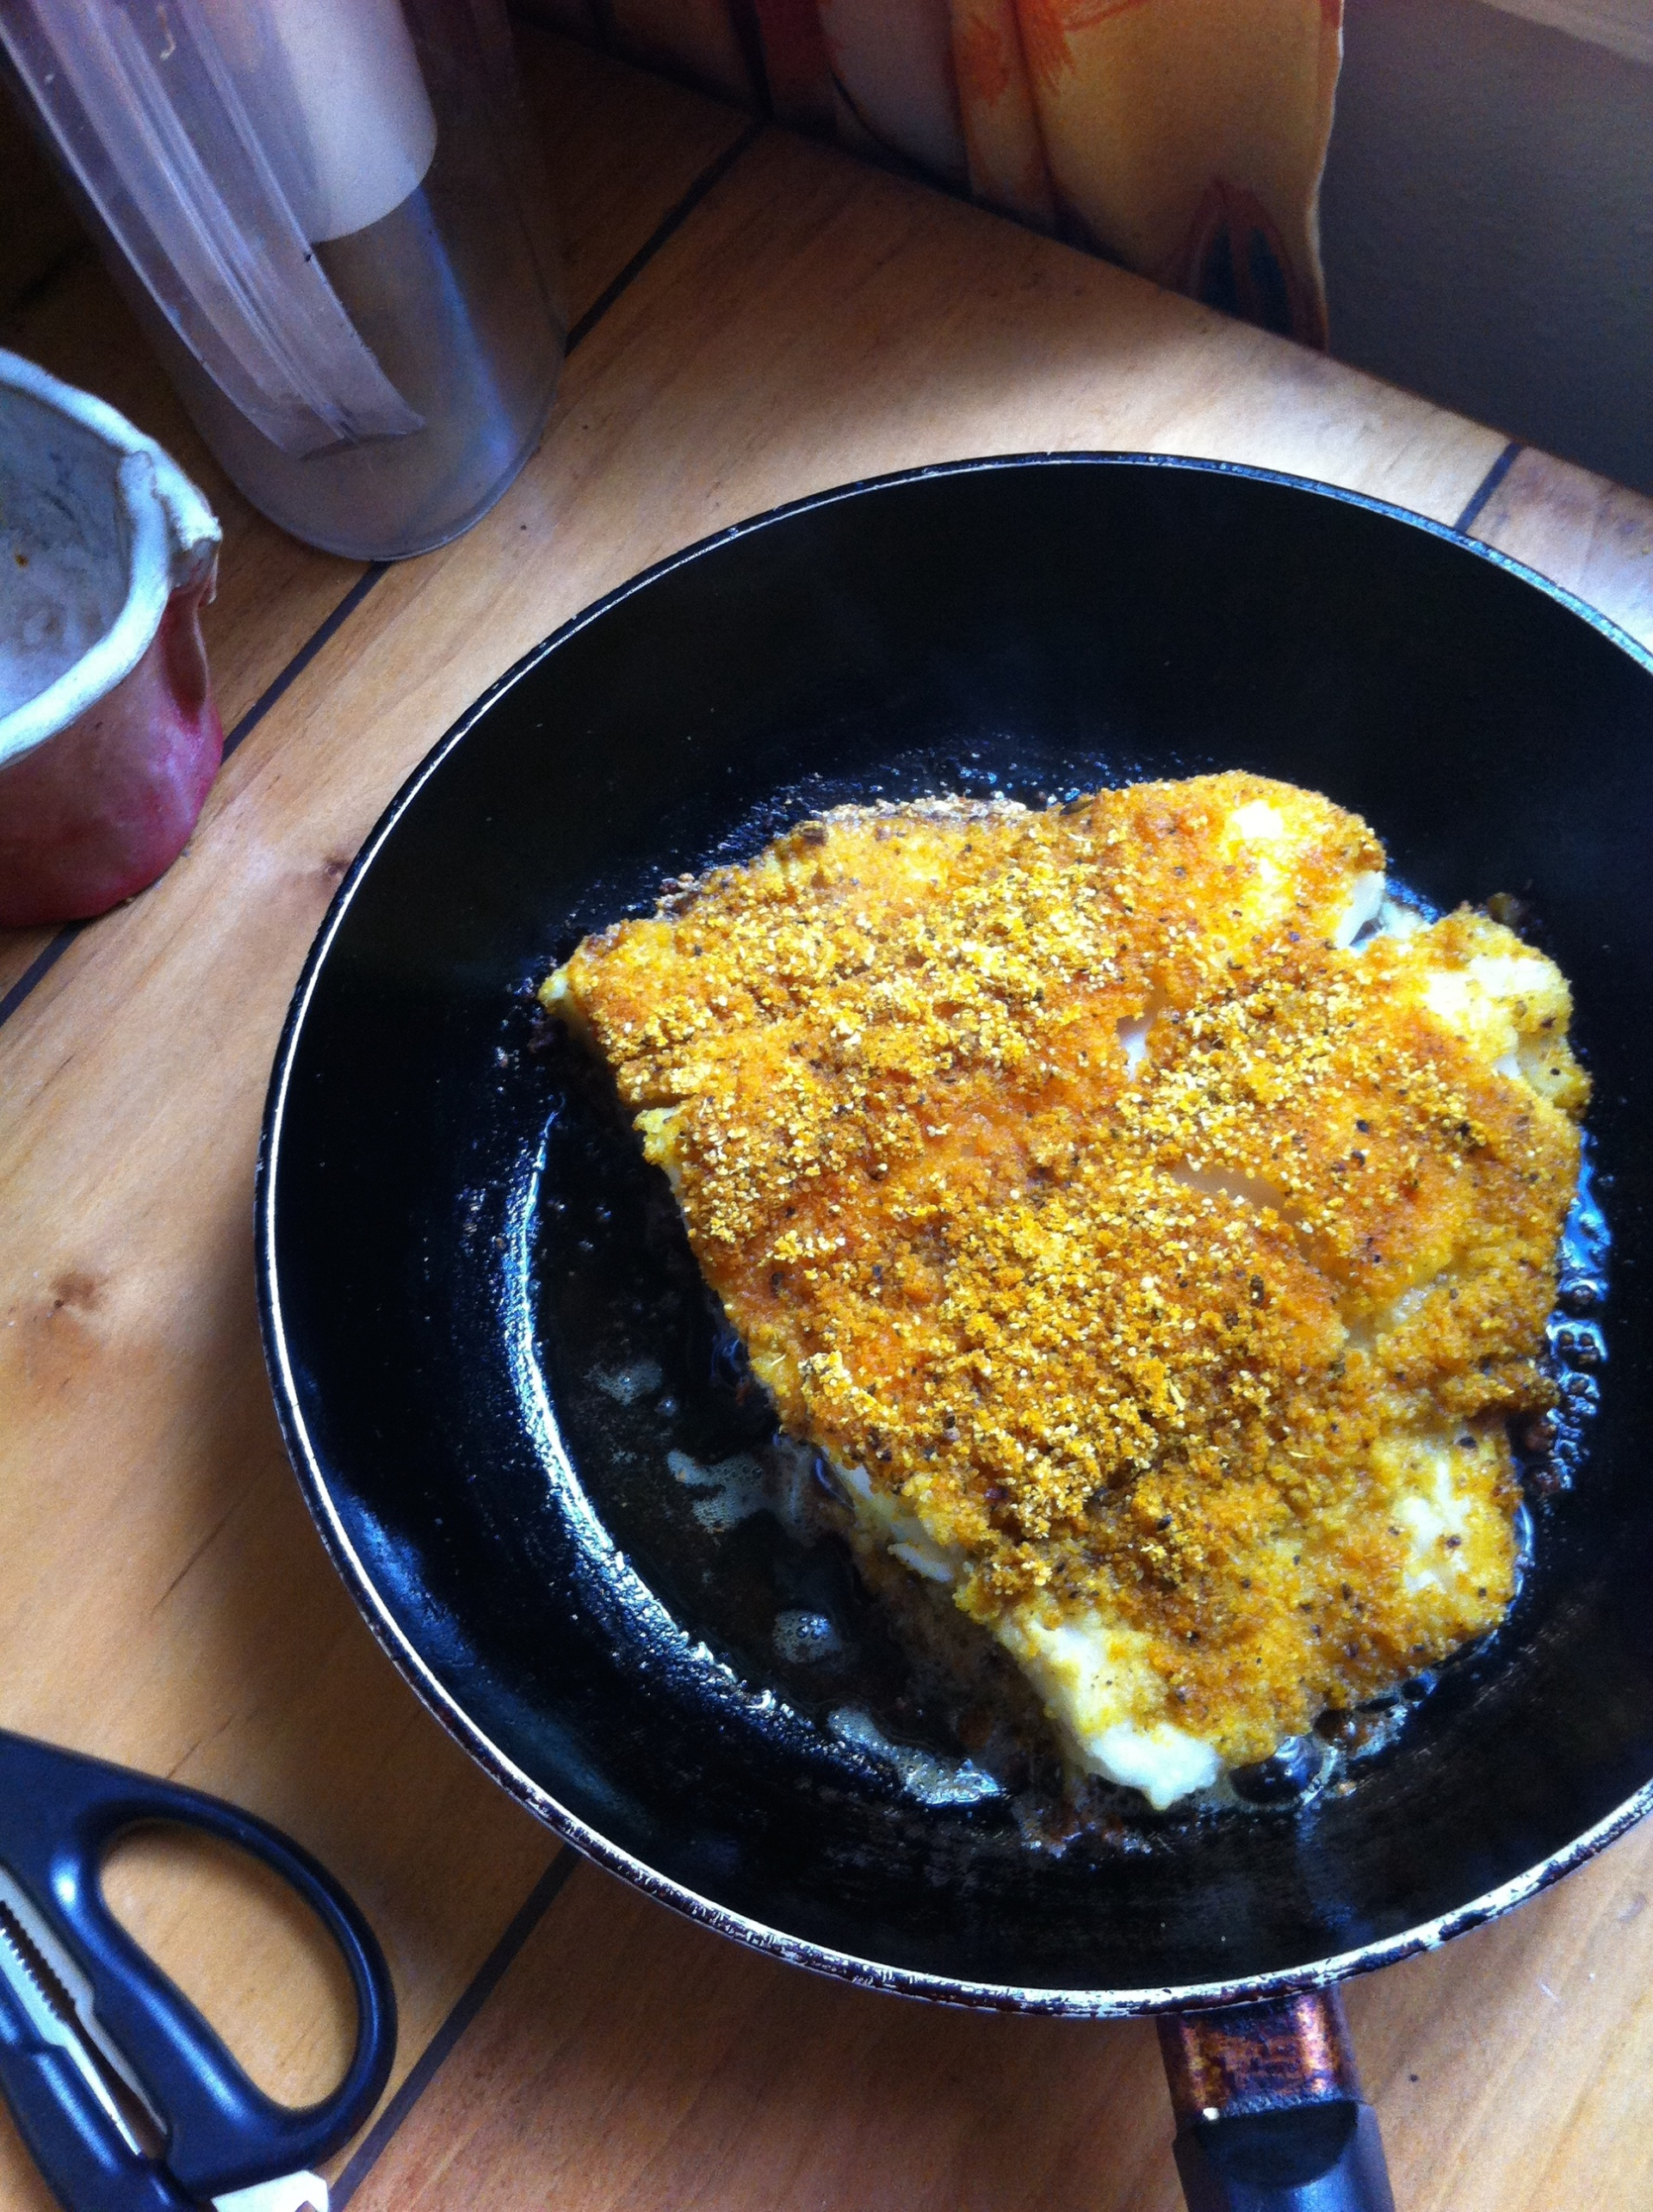 merluza apanada con cúrcuma y nuez moscada 2 paleo, primal, sin gluten, sin granos, sin azúcar